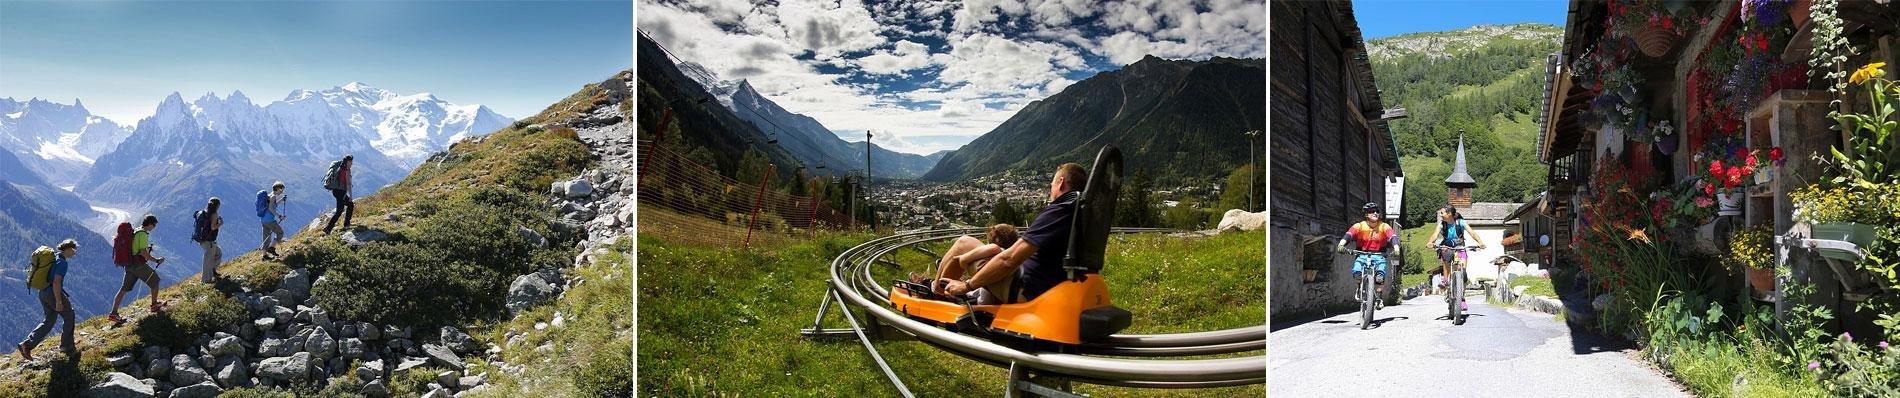 chamonix location chalets zomervakantie bergen alpen